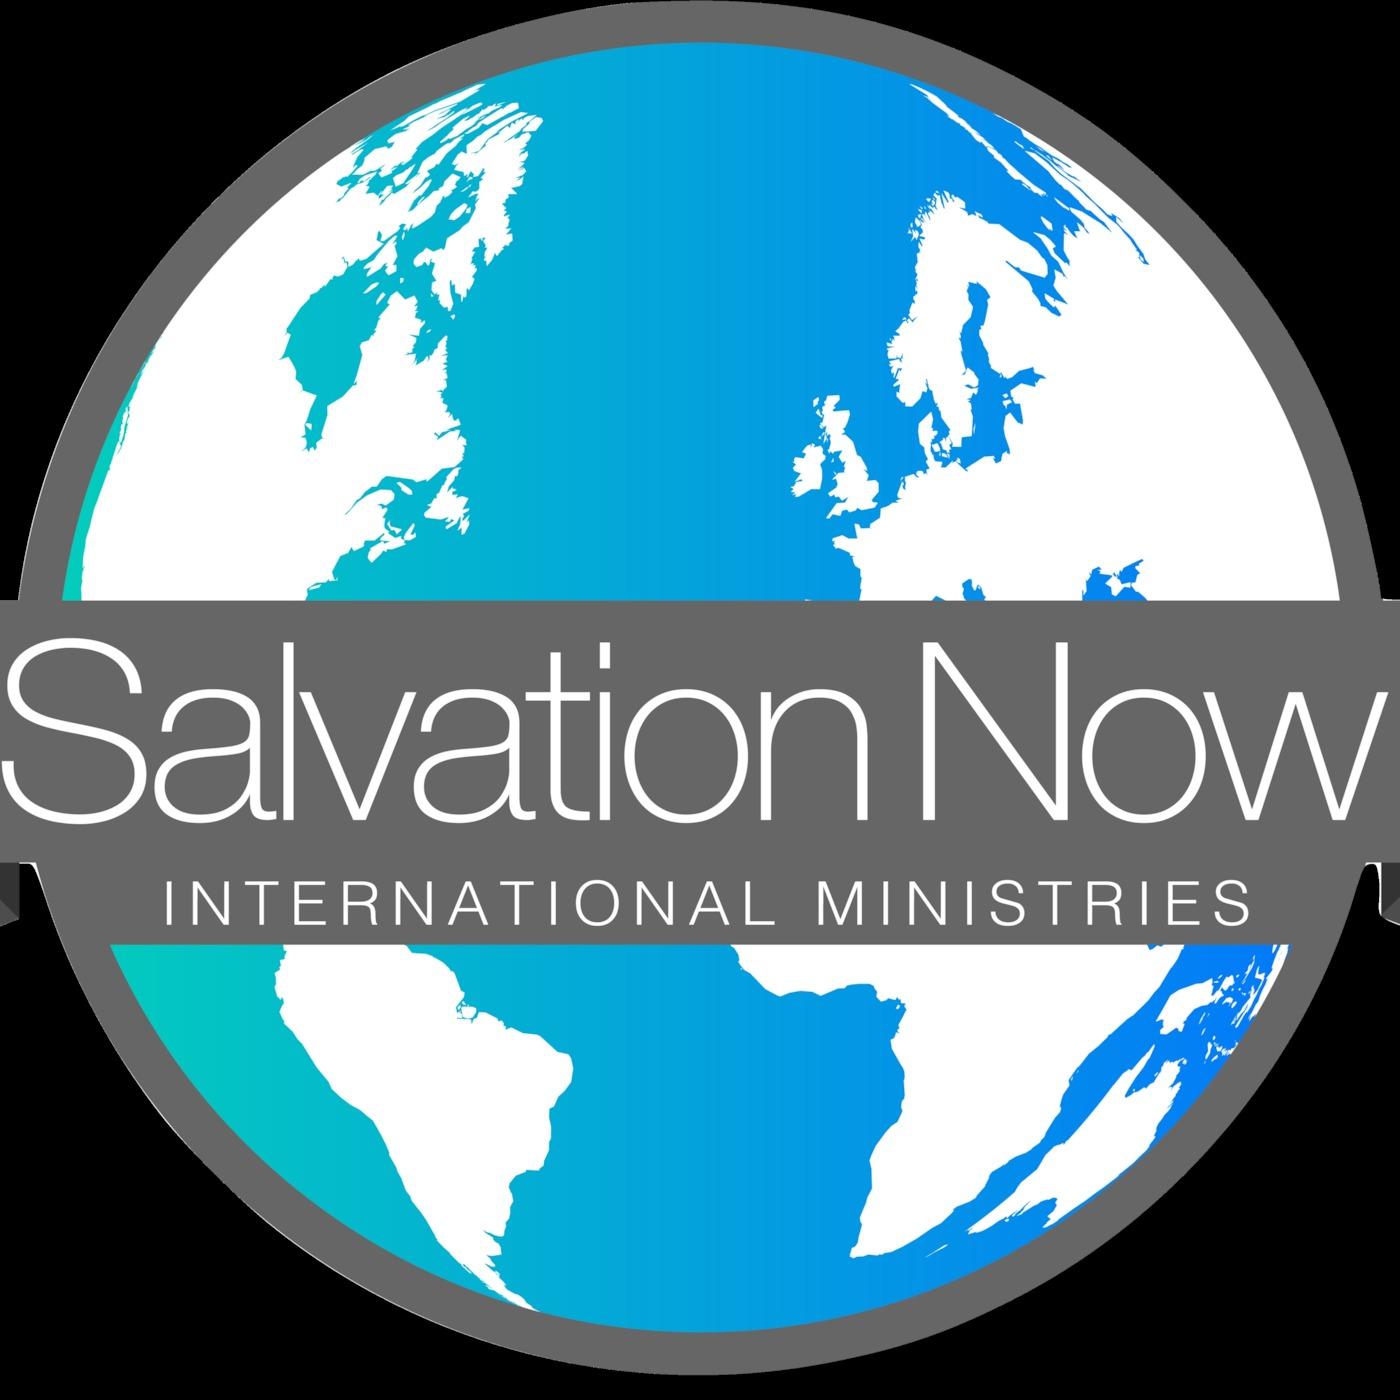 TJ Malcangi - Salvation Now